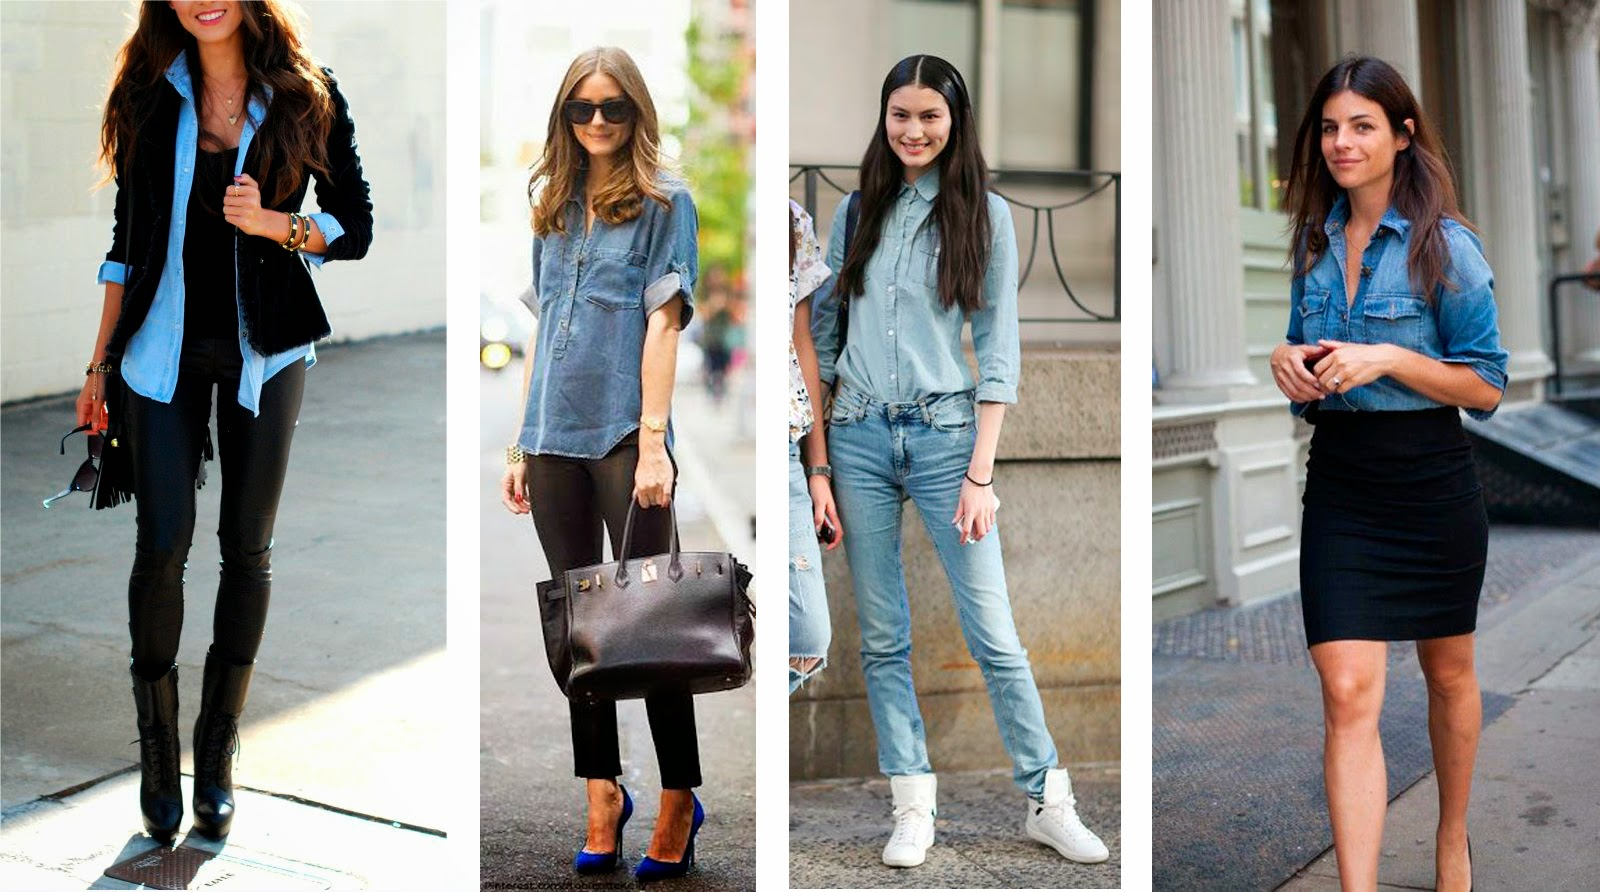 como usar una bluza de mezclilla con pantalon - Como Combinar Una Blusa De Mezclilla